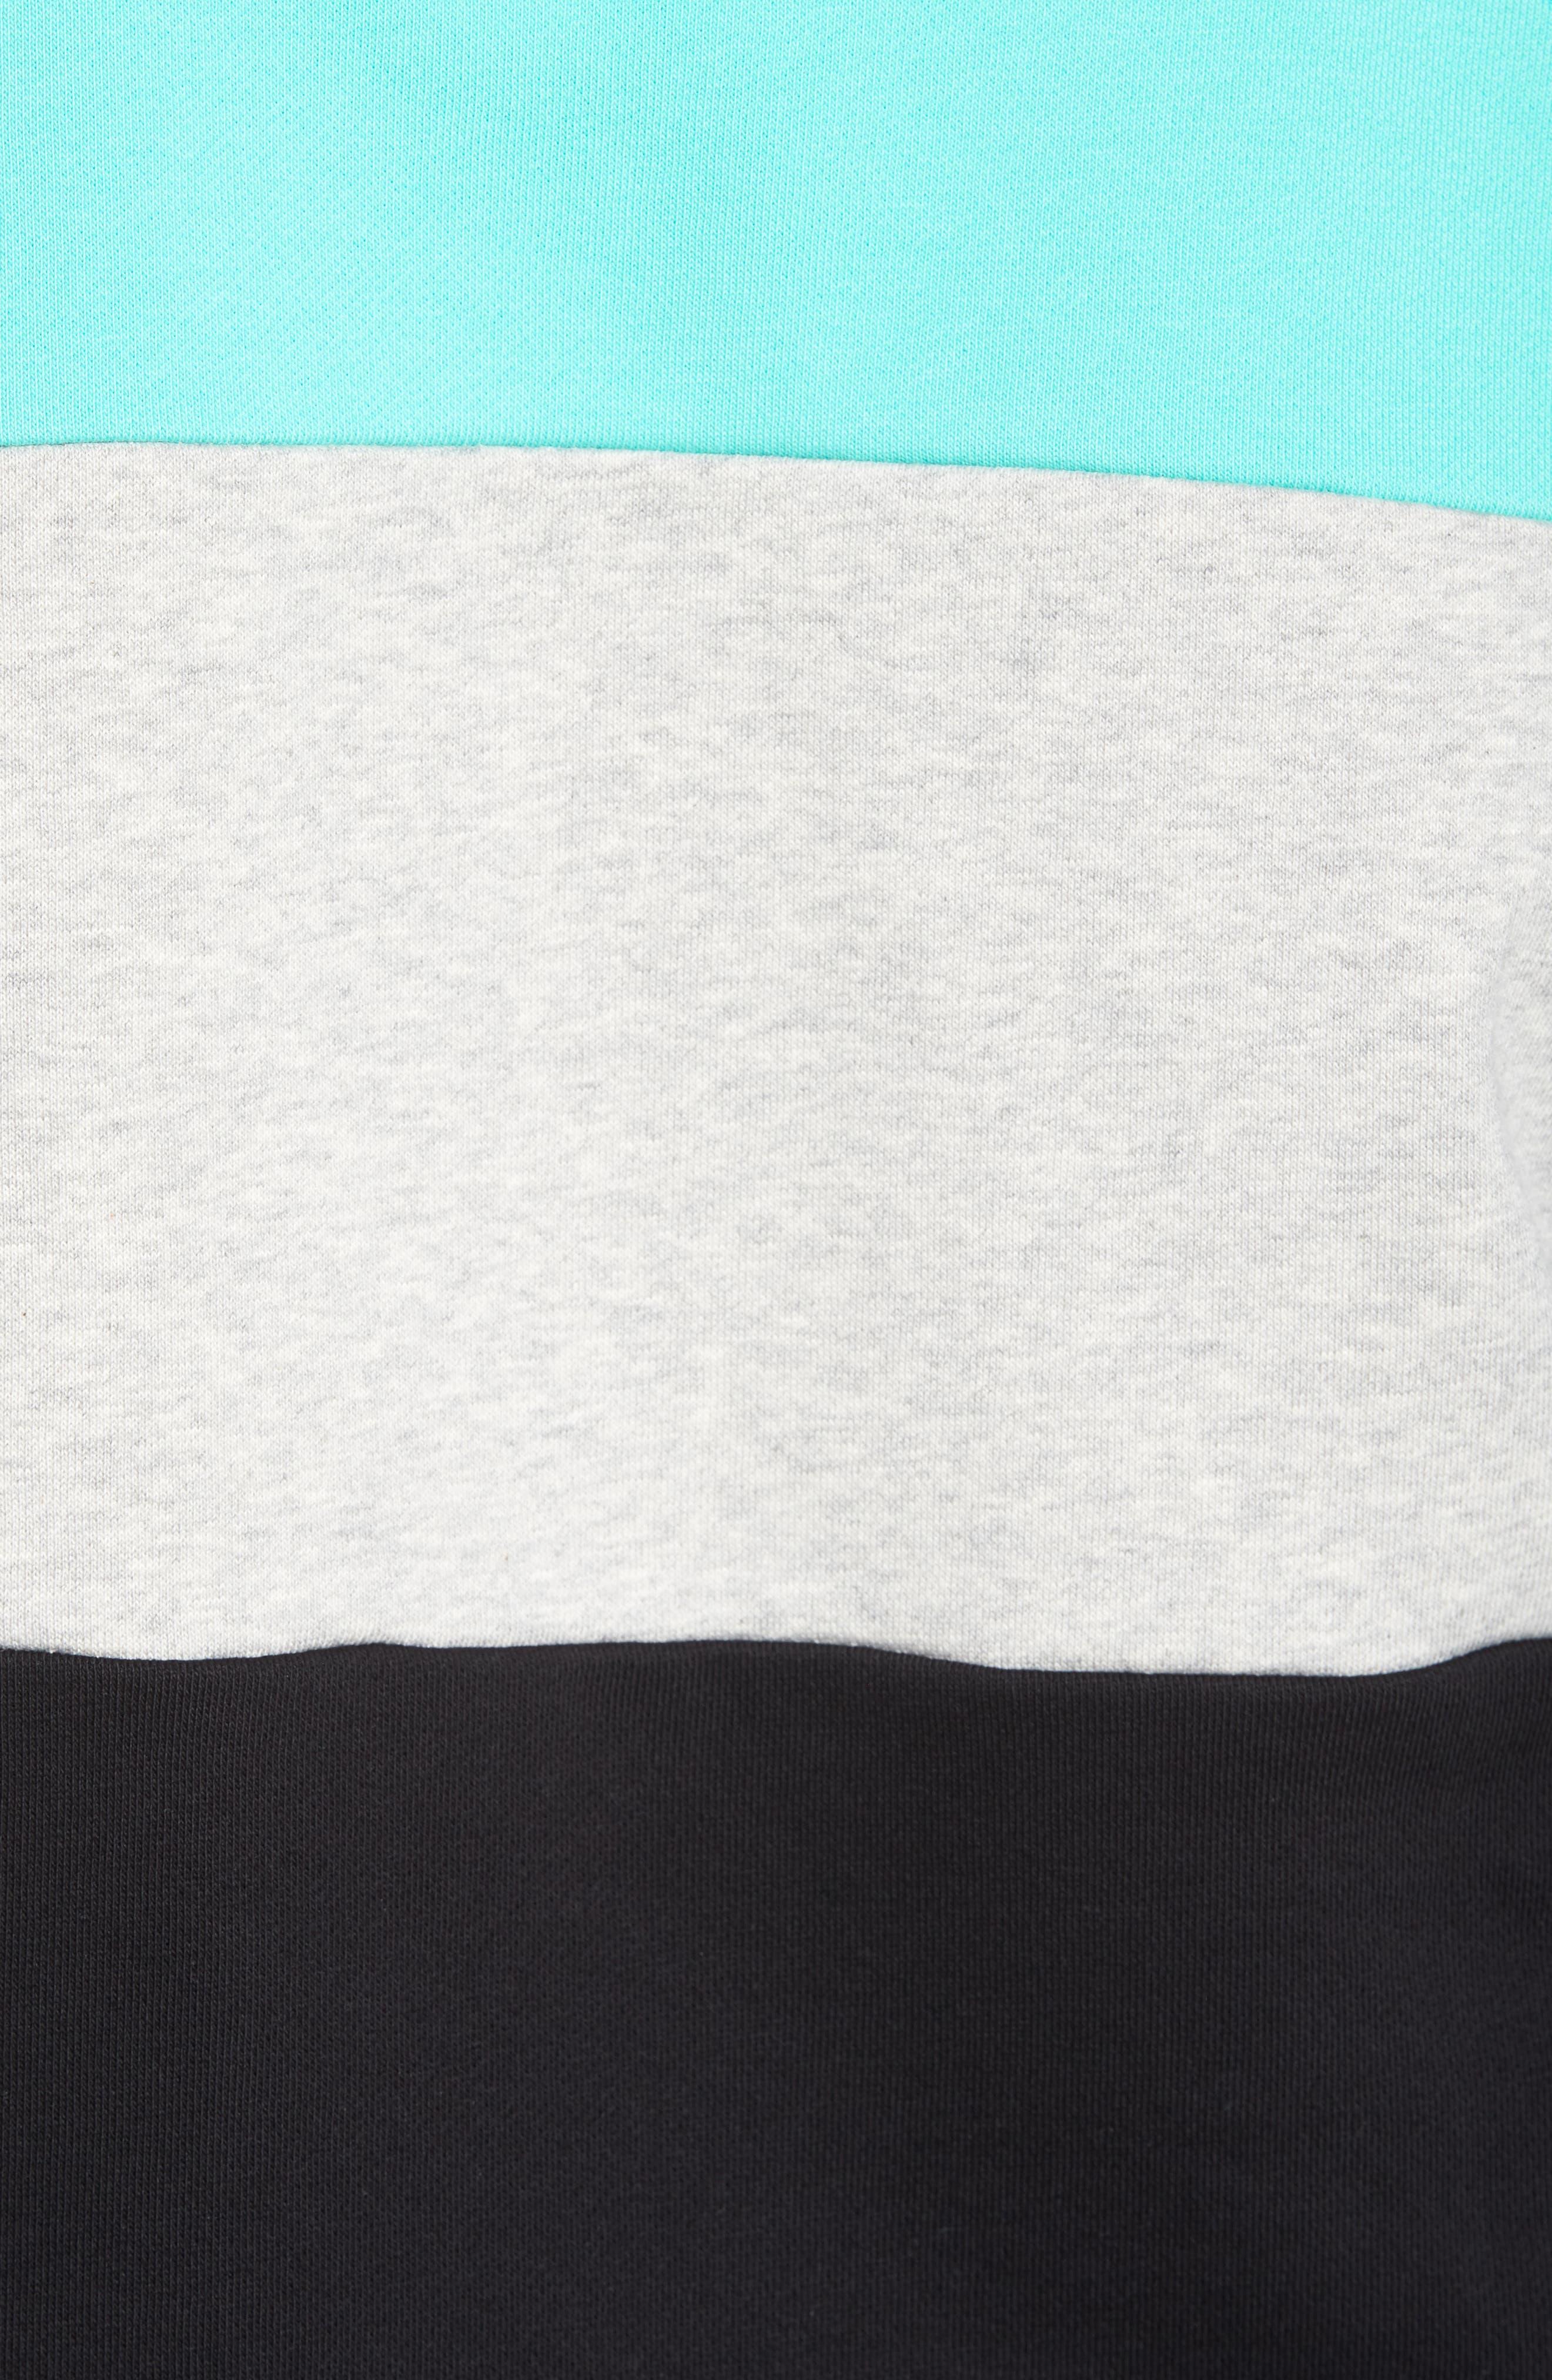 Layton Sweatshirt,                             Alternate thumbnail 5, color,                             Black/ Cockatoo/ Grey Marl